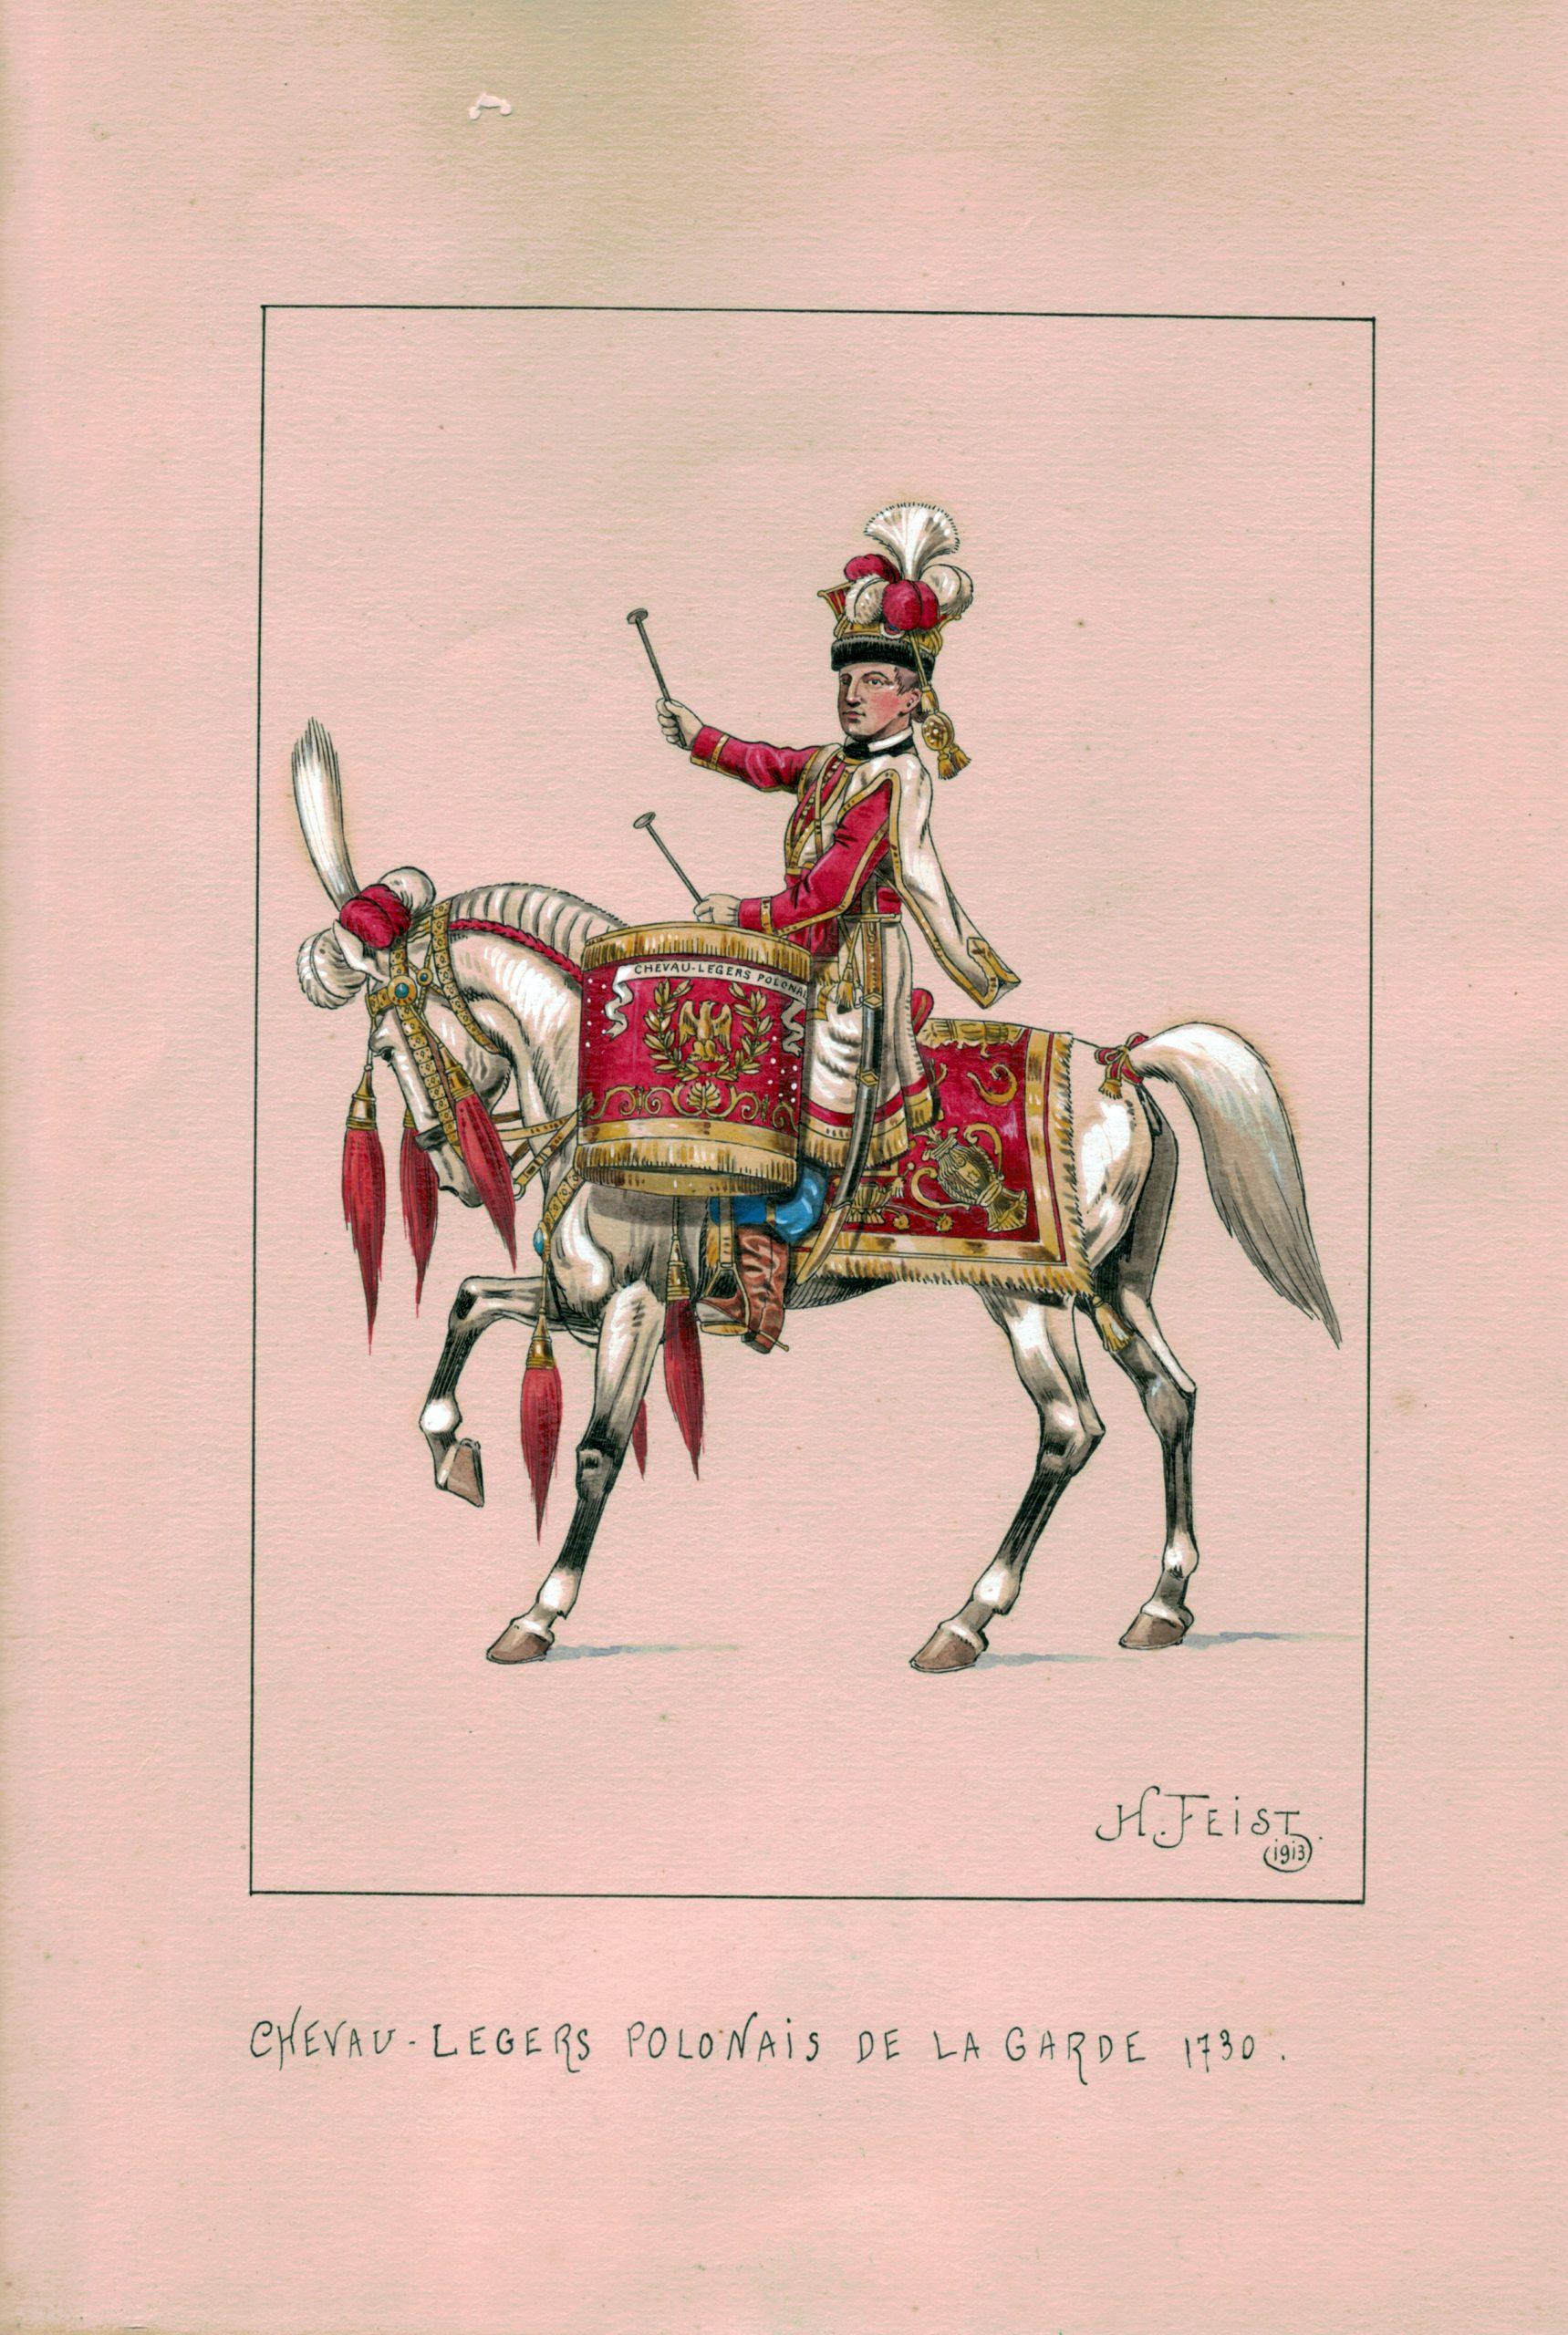 Timbalier - Garde Impériale - Henri Feist - Gouache - 1er Empire - Uniforme - Chevau légers Polonais